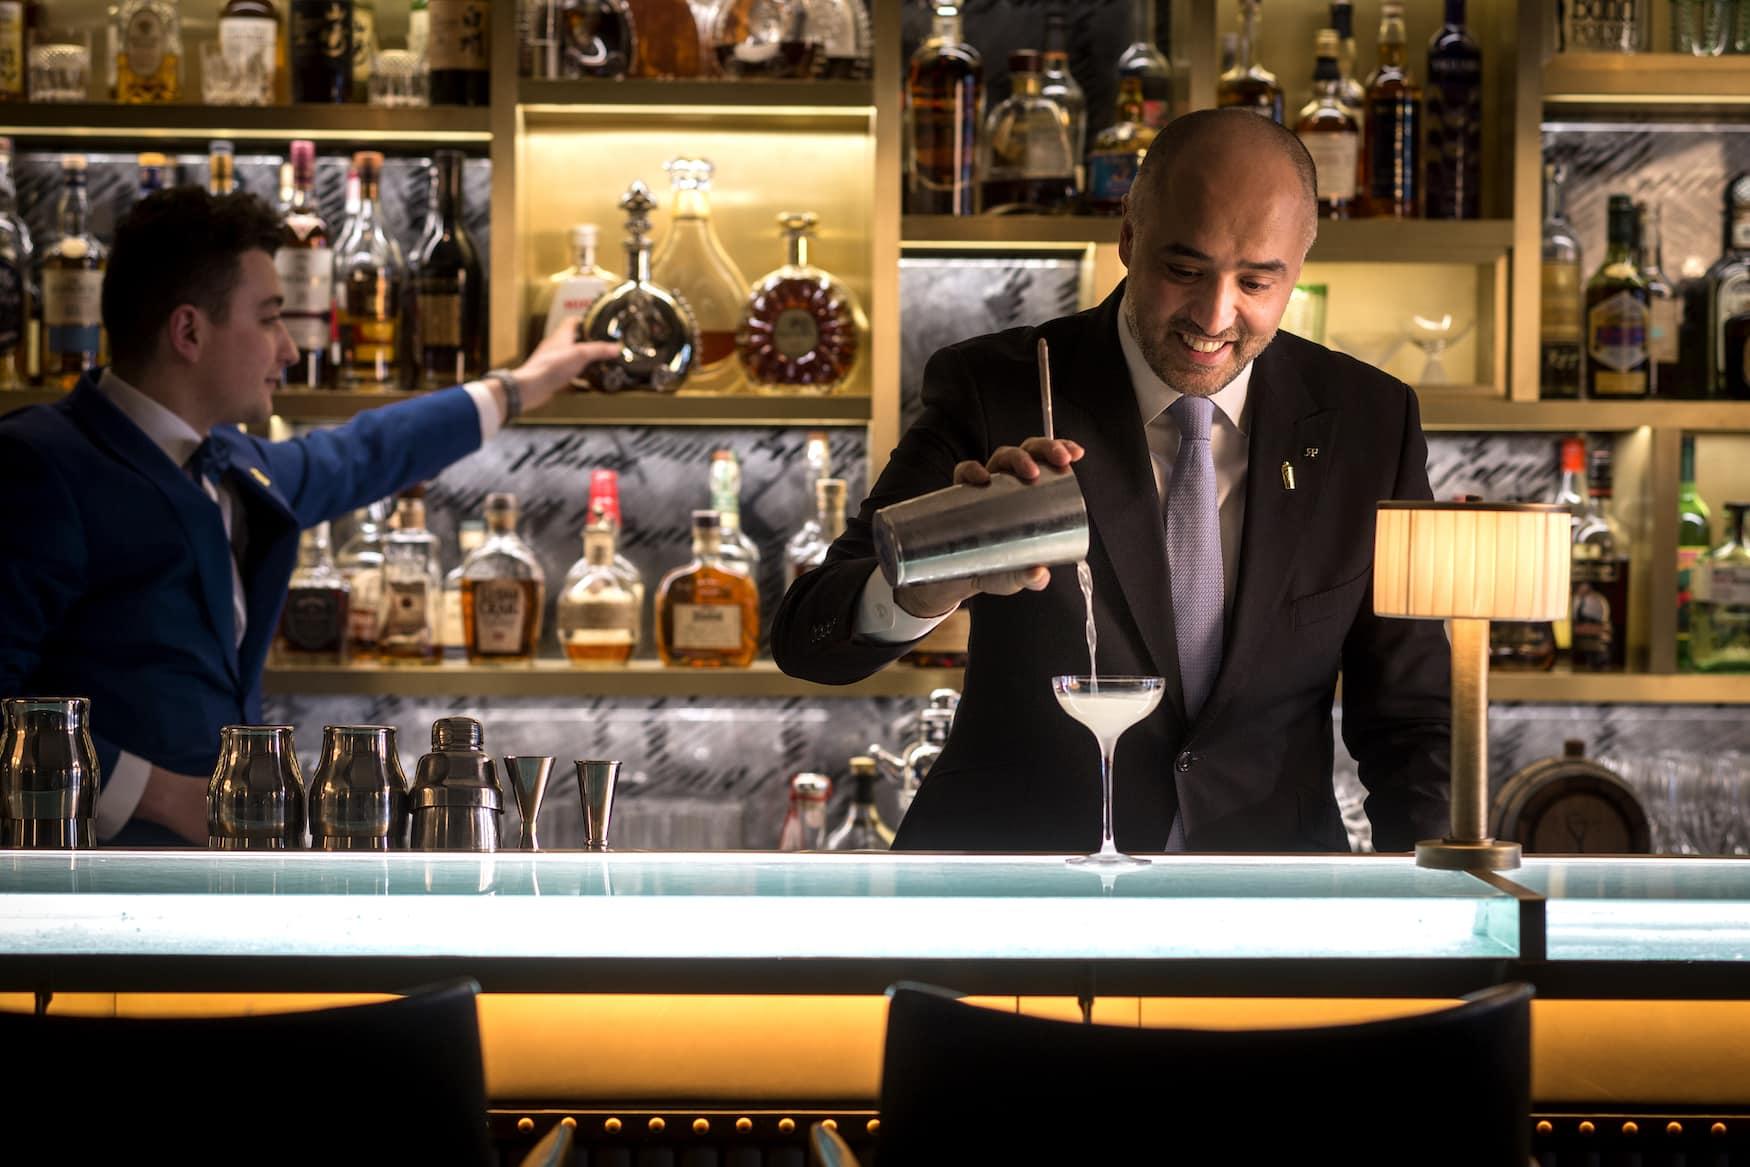 Barkeeper in der The Donovan Bar im Browns Hotel in London